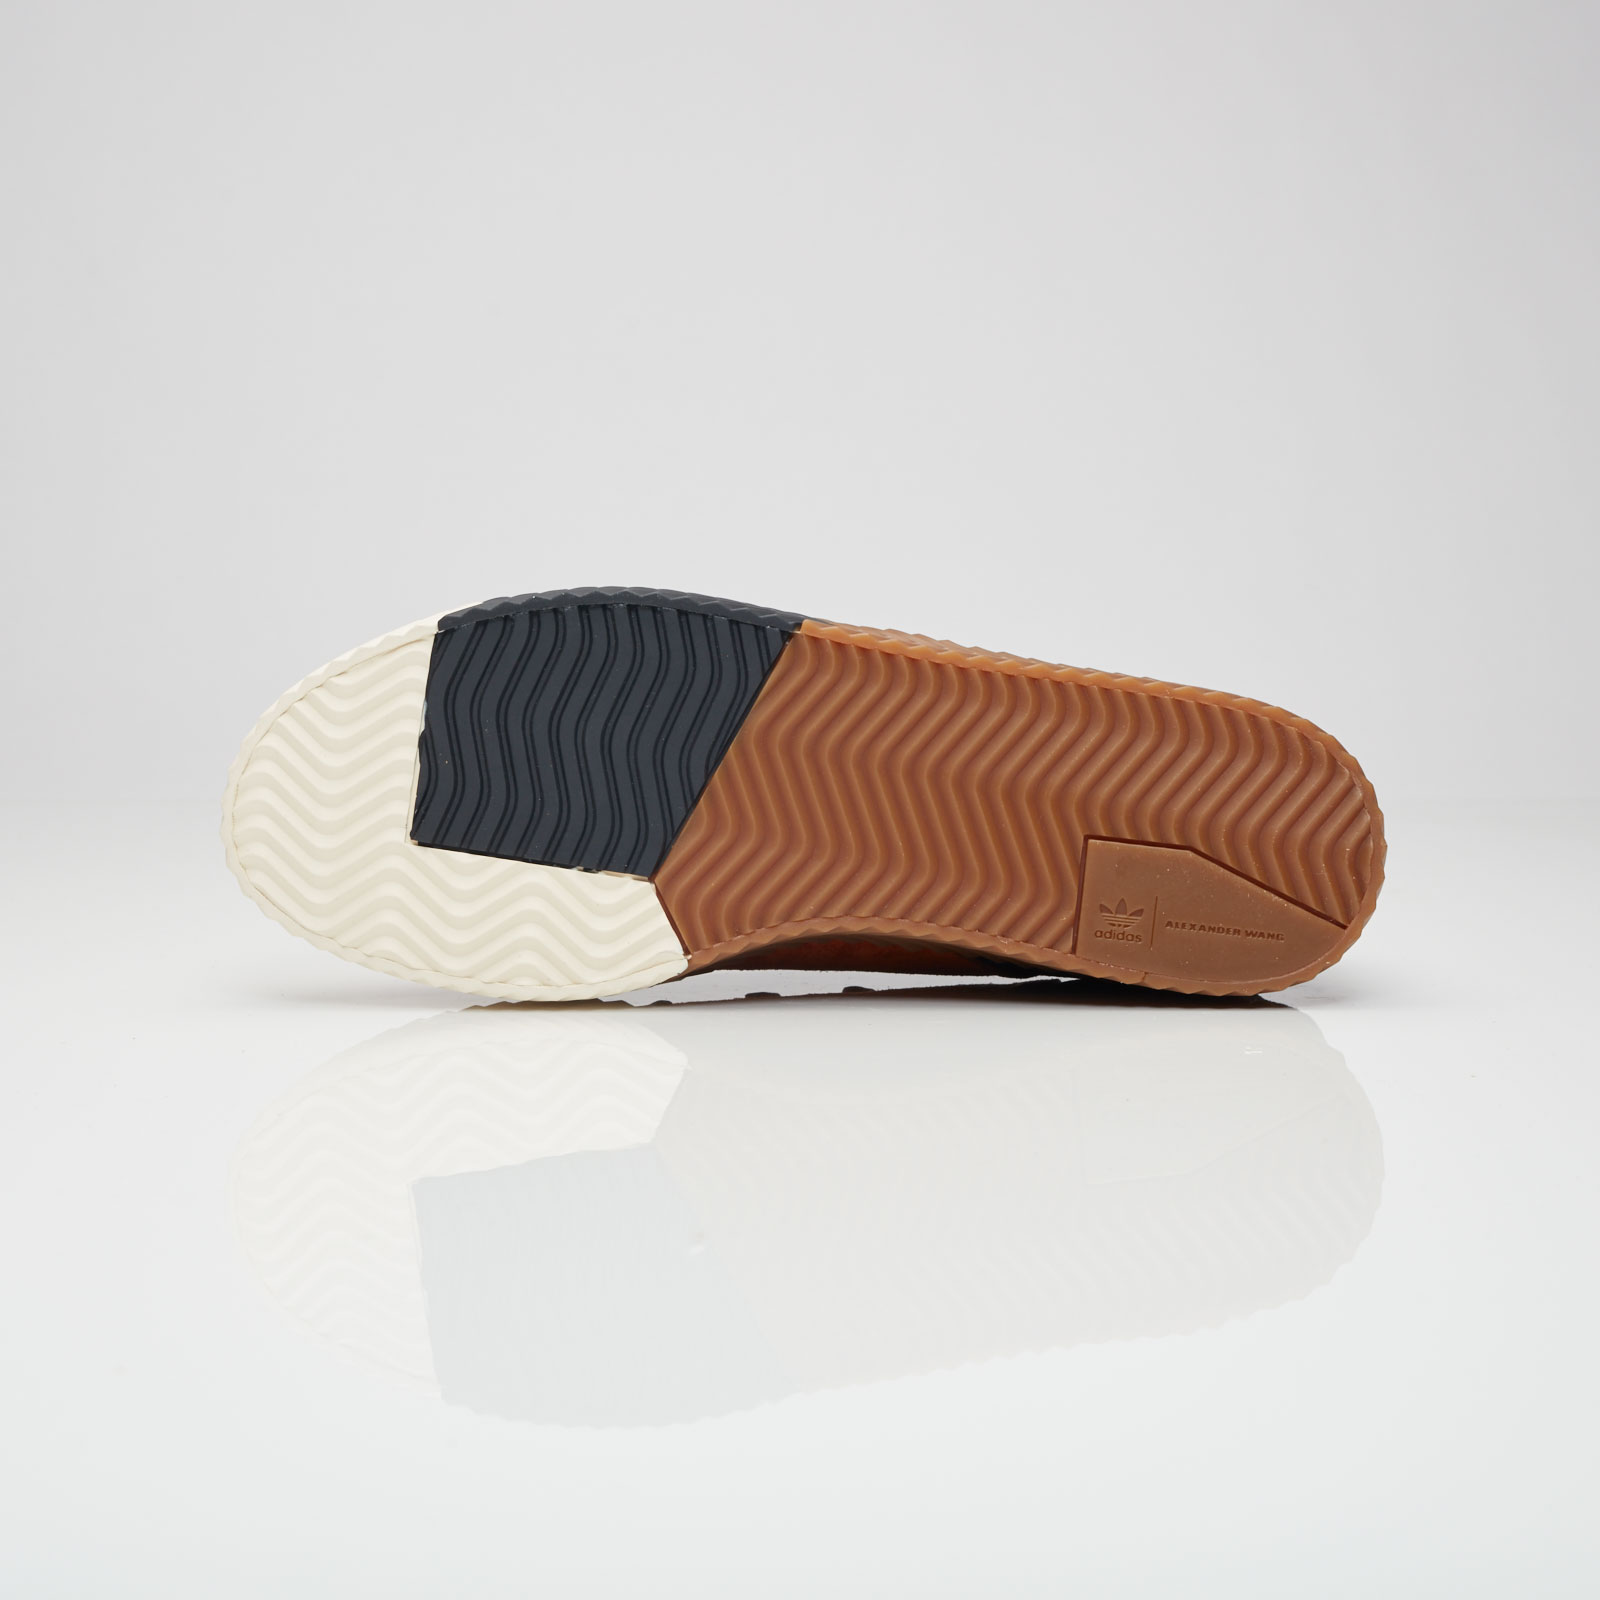 best website f1662 72d12 ... adidas Originals by Alexander Wang Skate Shoes Low ...